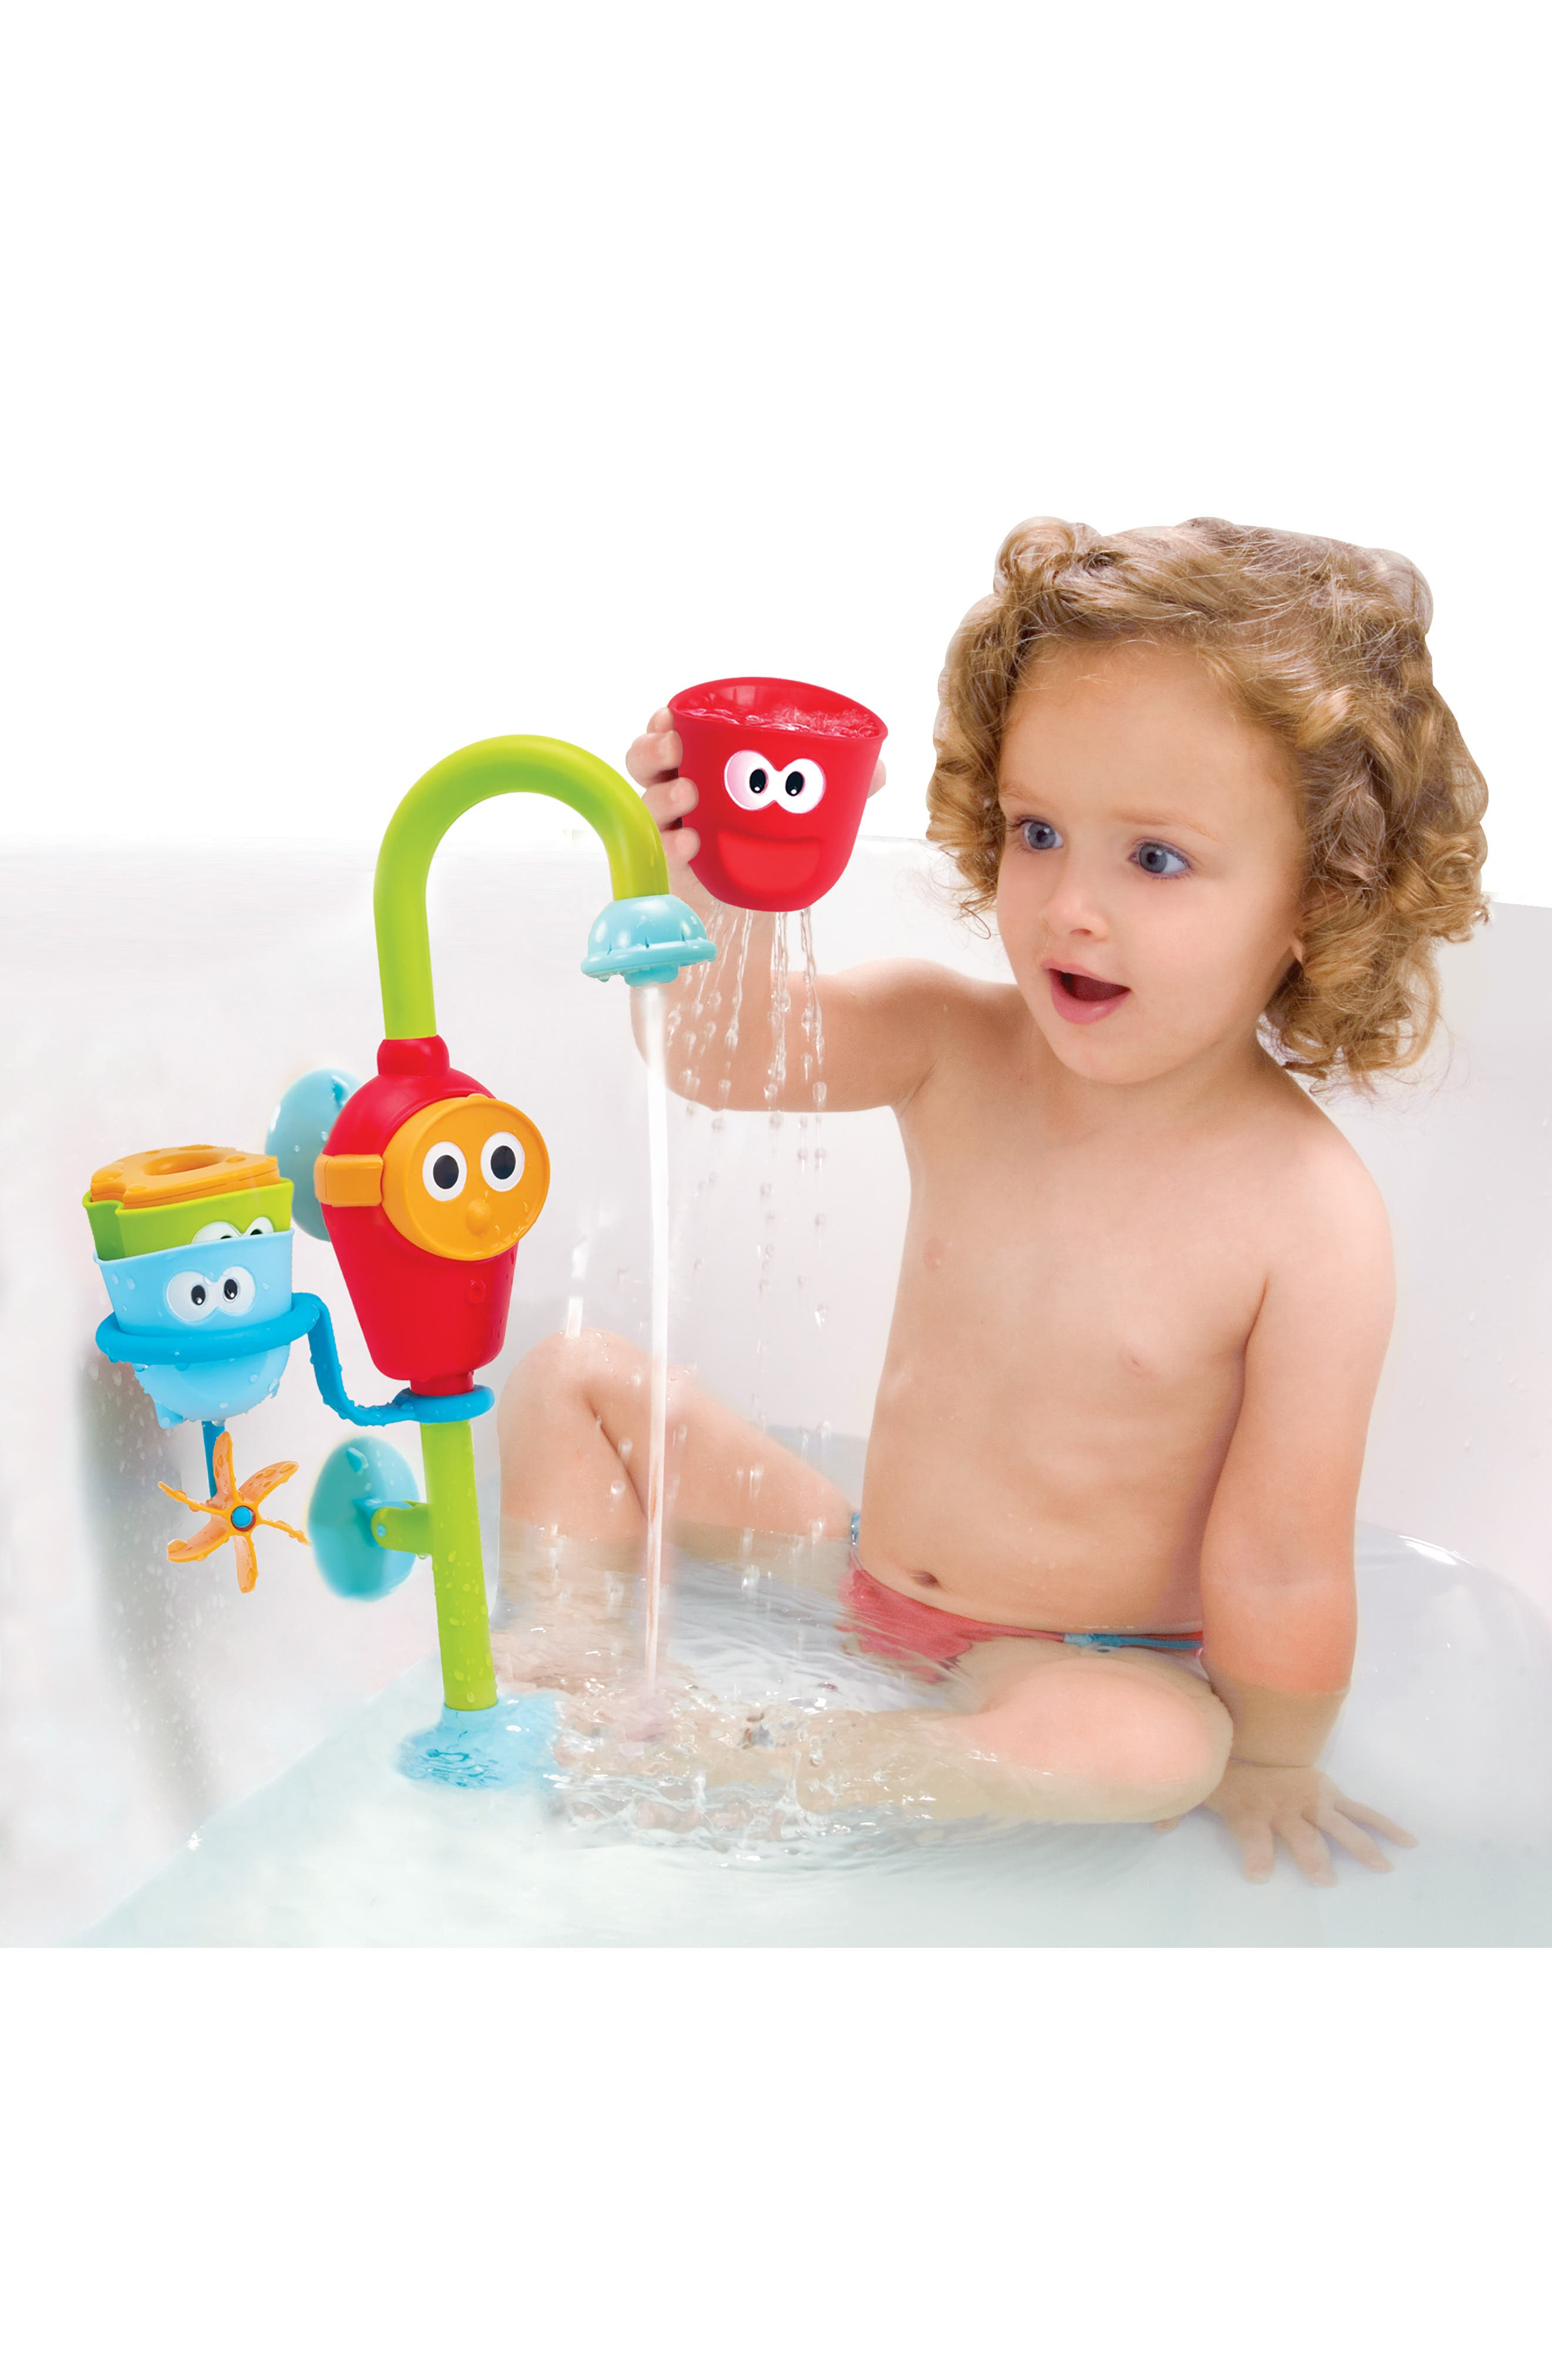 Flow 'N' Fill Spout Bath Toy,                             Alternate thumbnail 7, color,                             GREEN